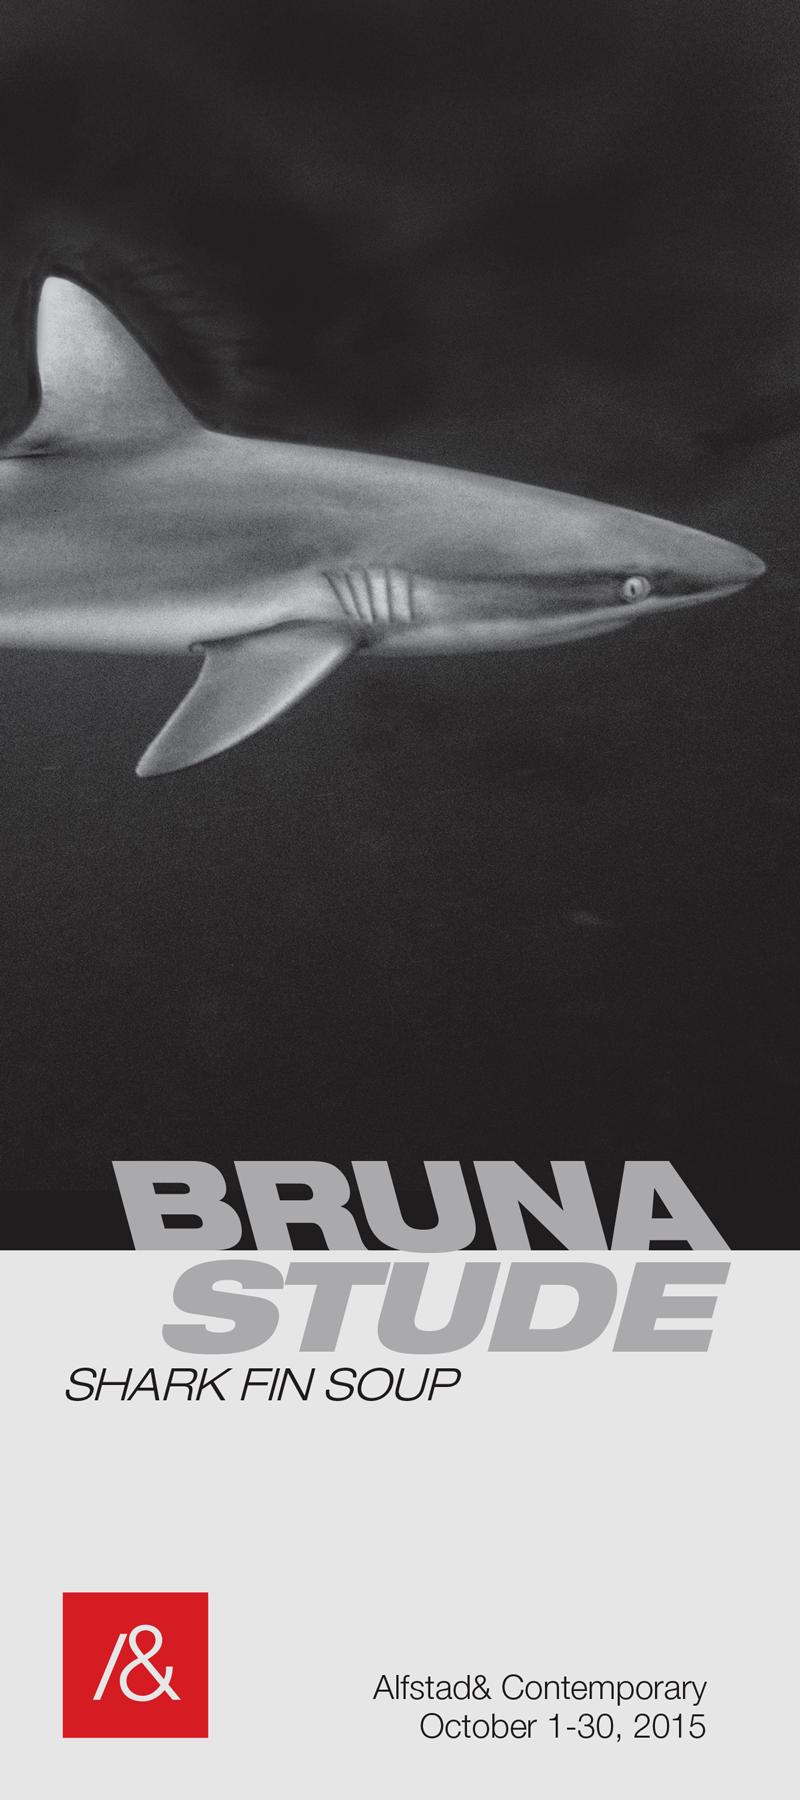 brune_stude_rackcard_f2-1.png